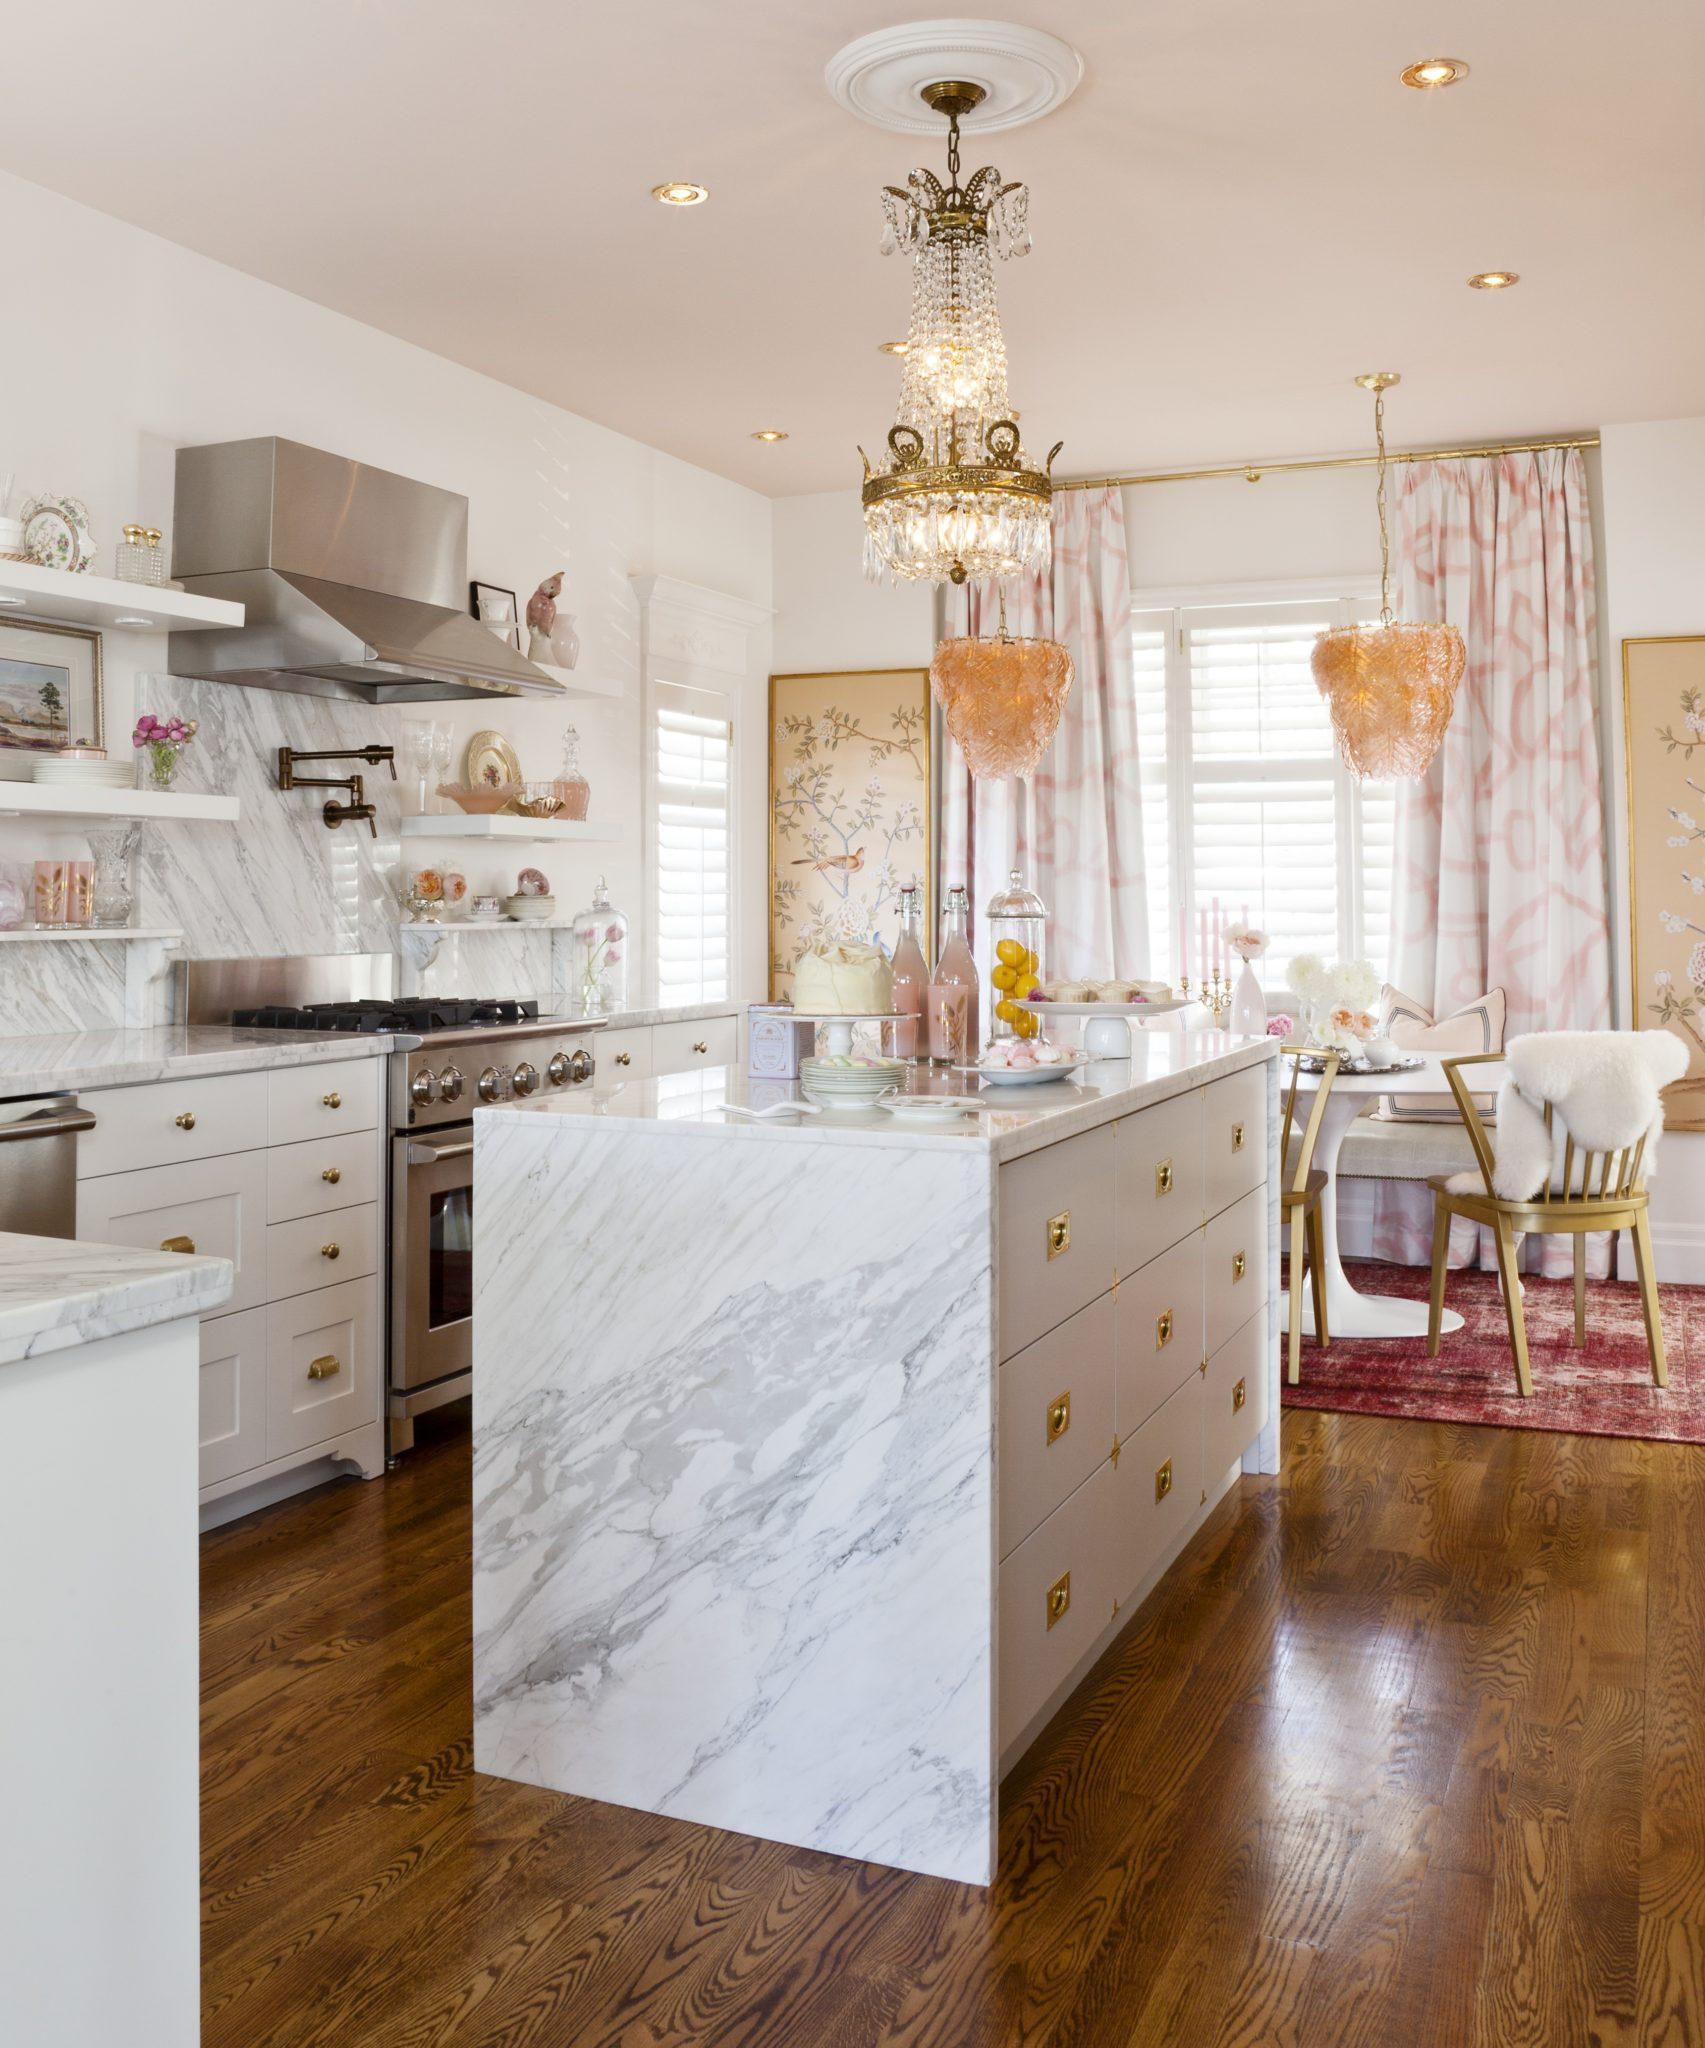 Pine Residence by Meredith Heron Design